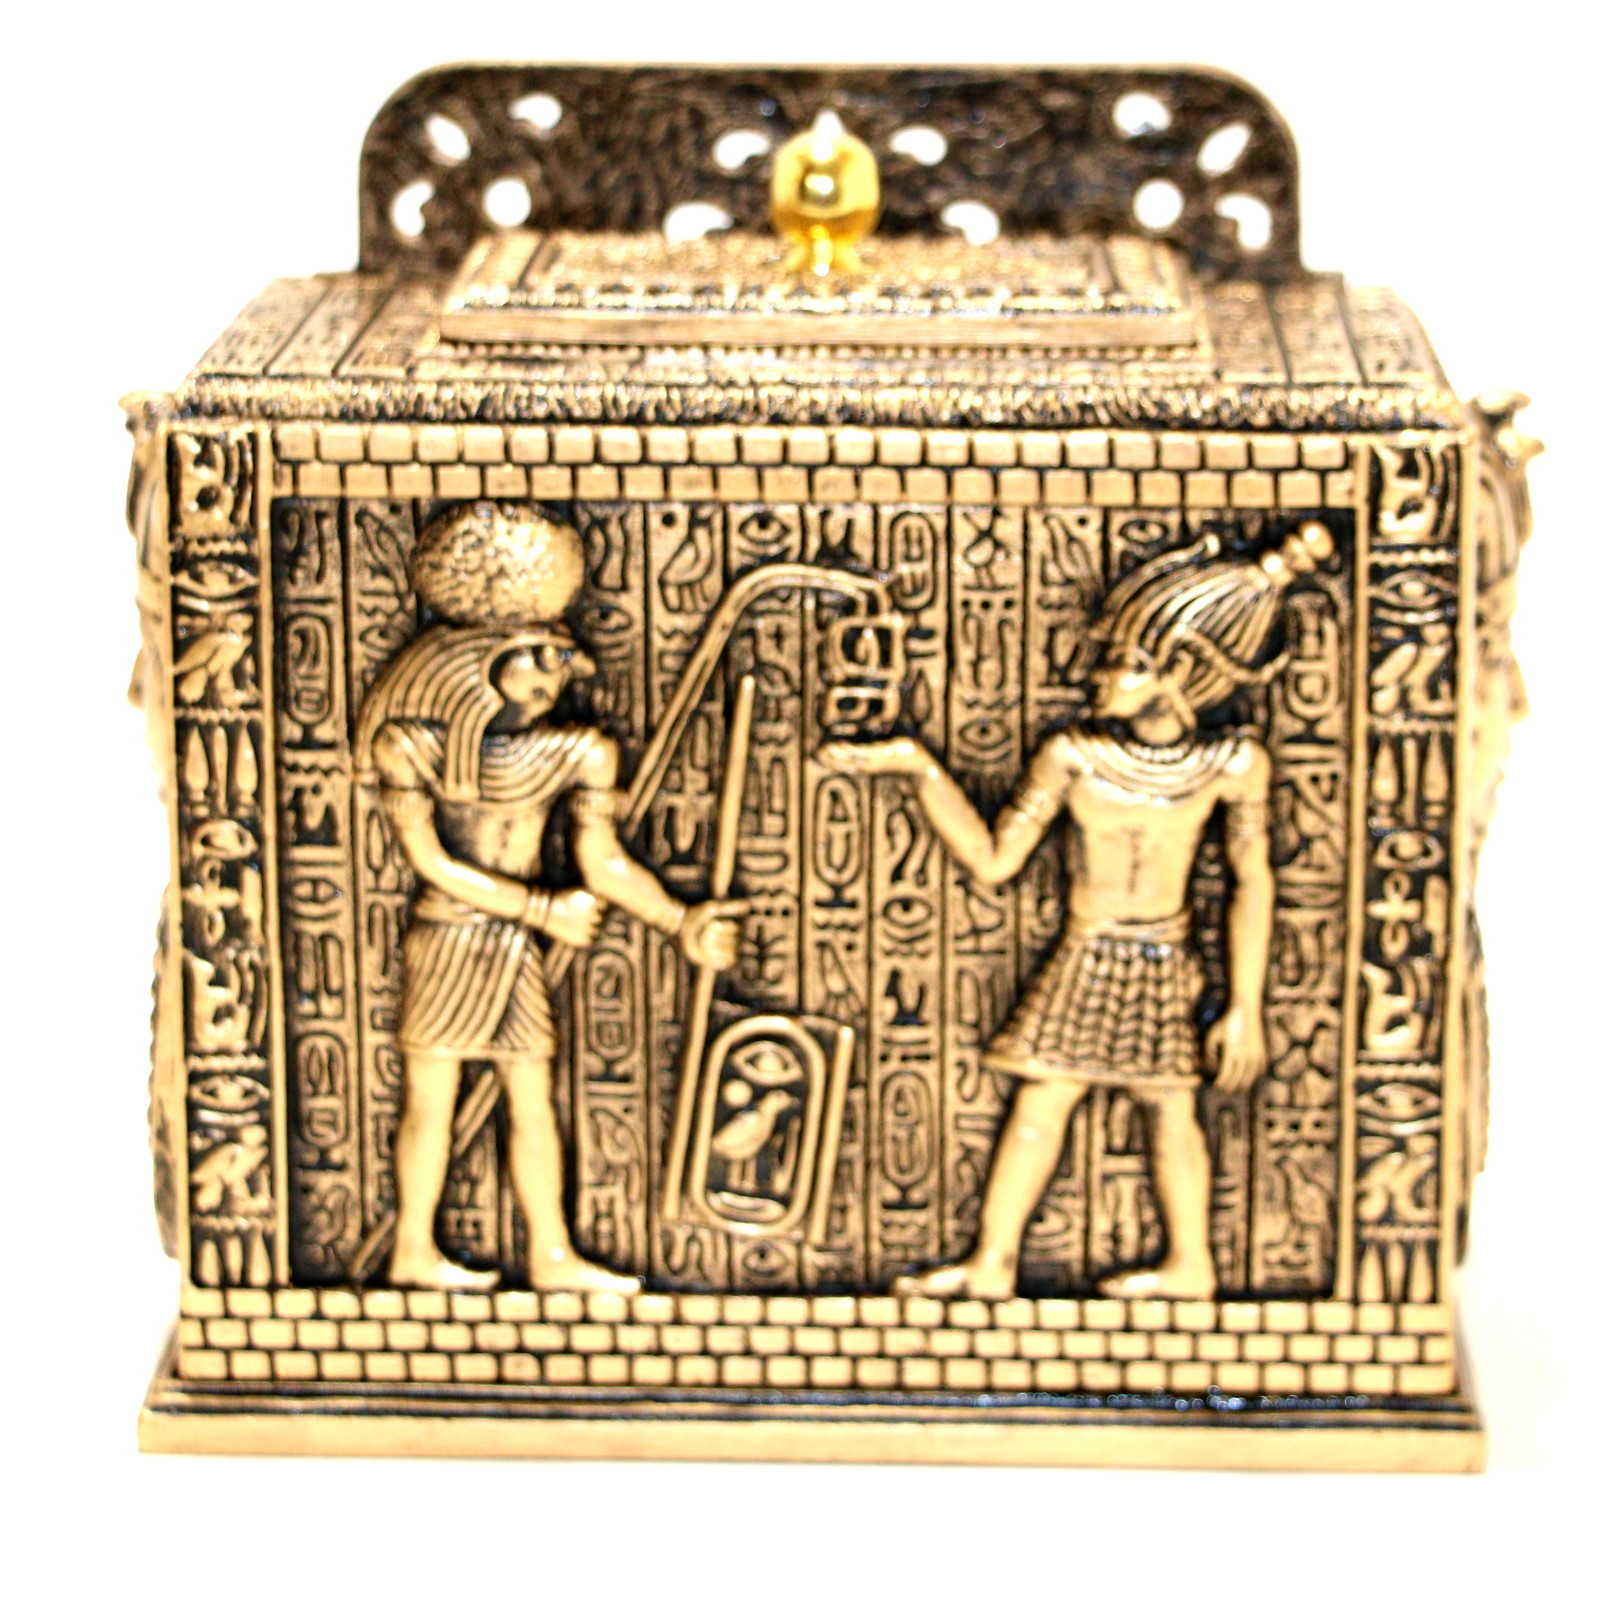 Saqqara Mystery by Magic Wagon